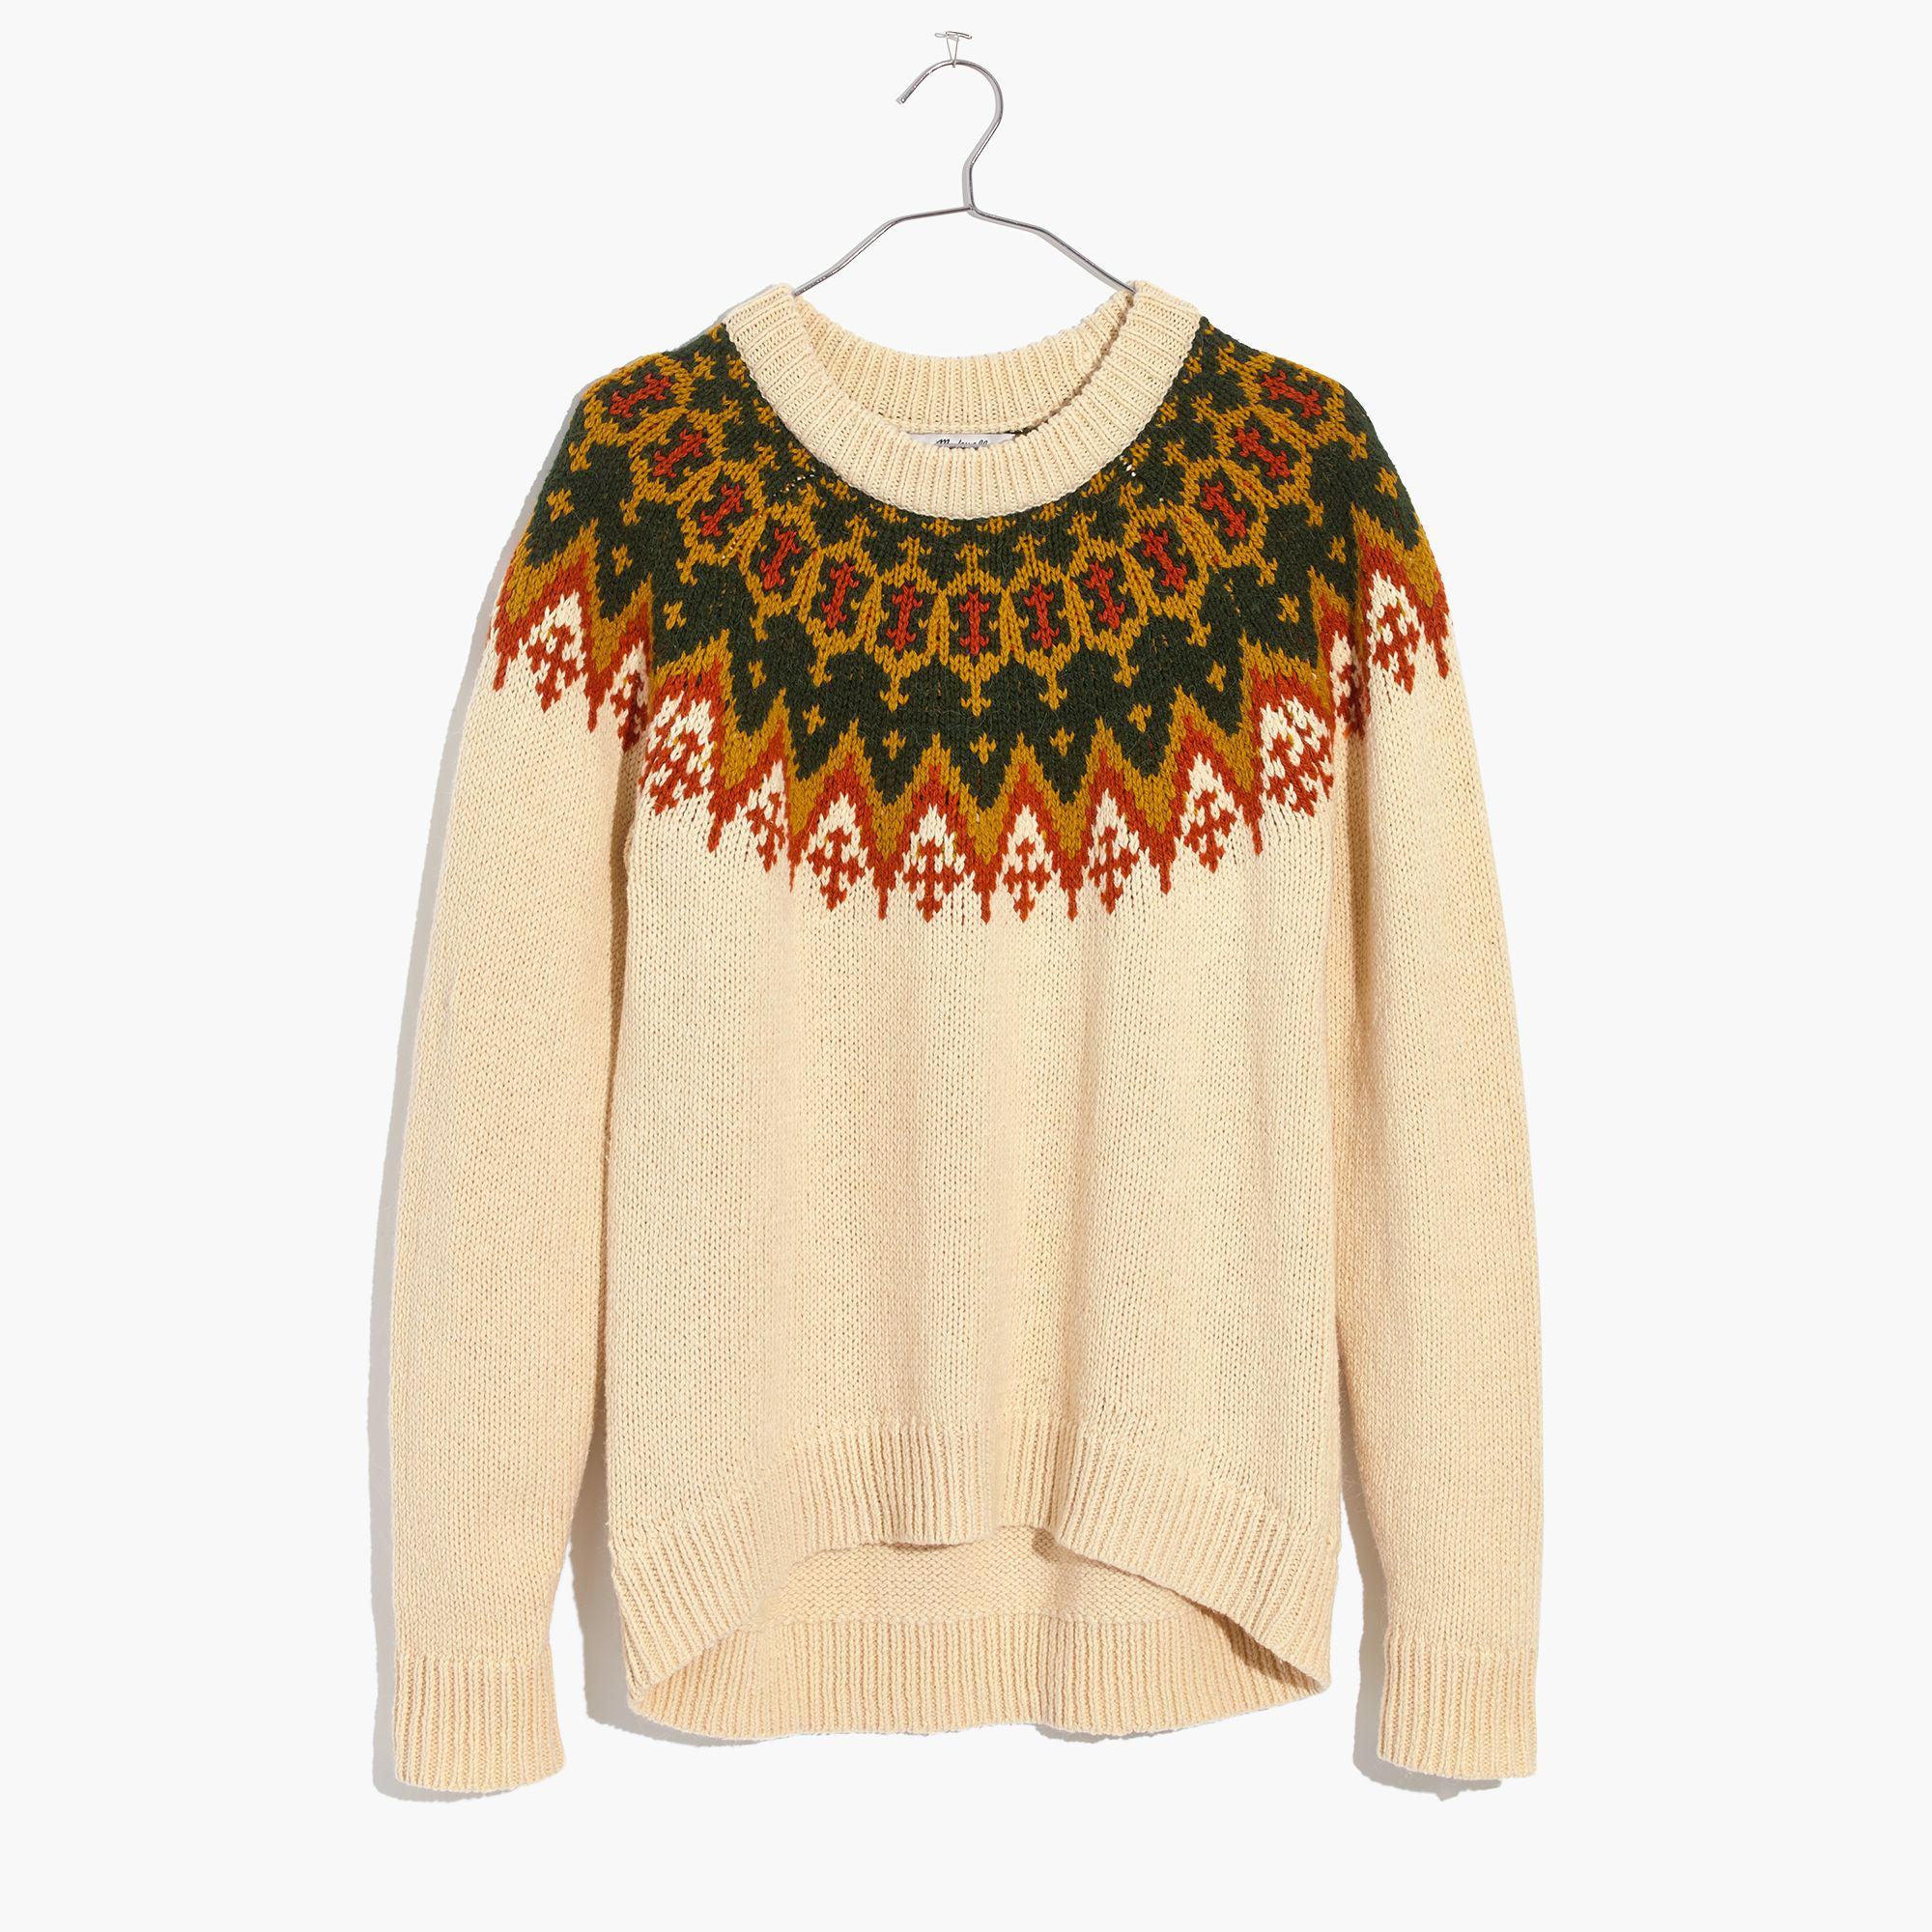 Madewell Fair Isle Pullover Sweater | Lyst